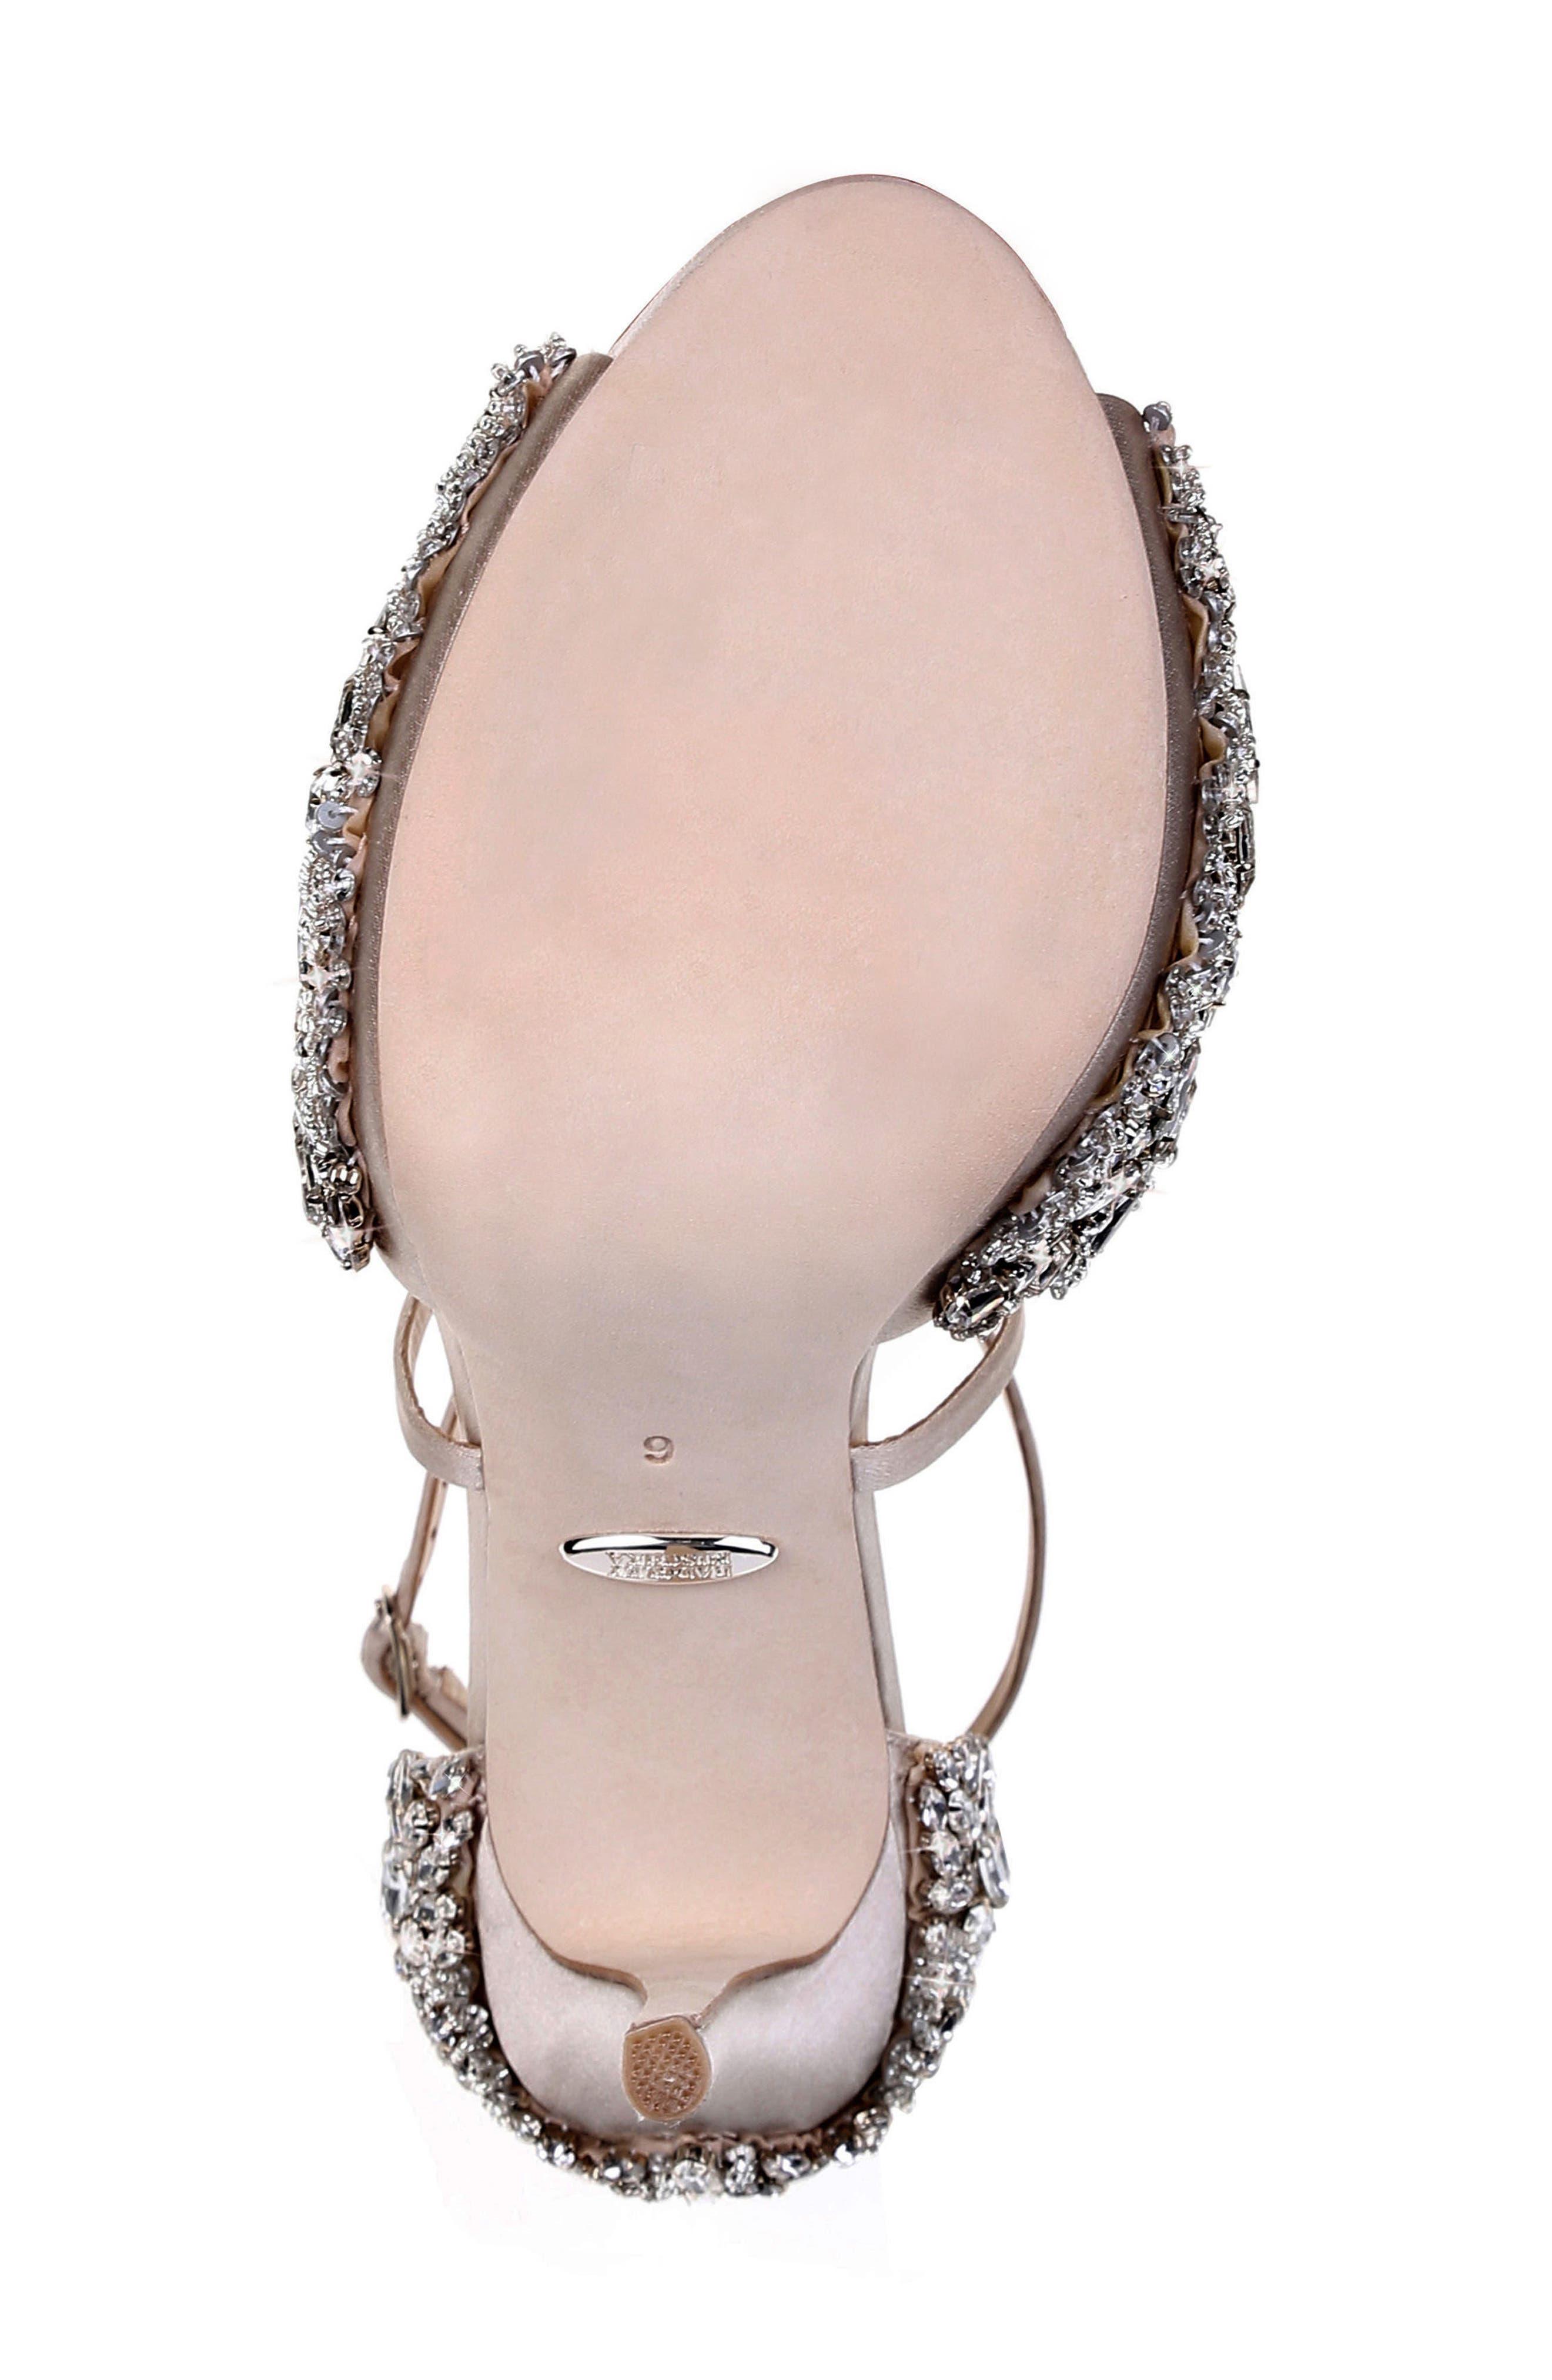 BADGLEY MISCHKA COLLECTION, Badgley Mischka Hyper Crystal Embellished Sandal, Alternate thumbnail 6, color, 100